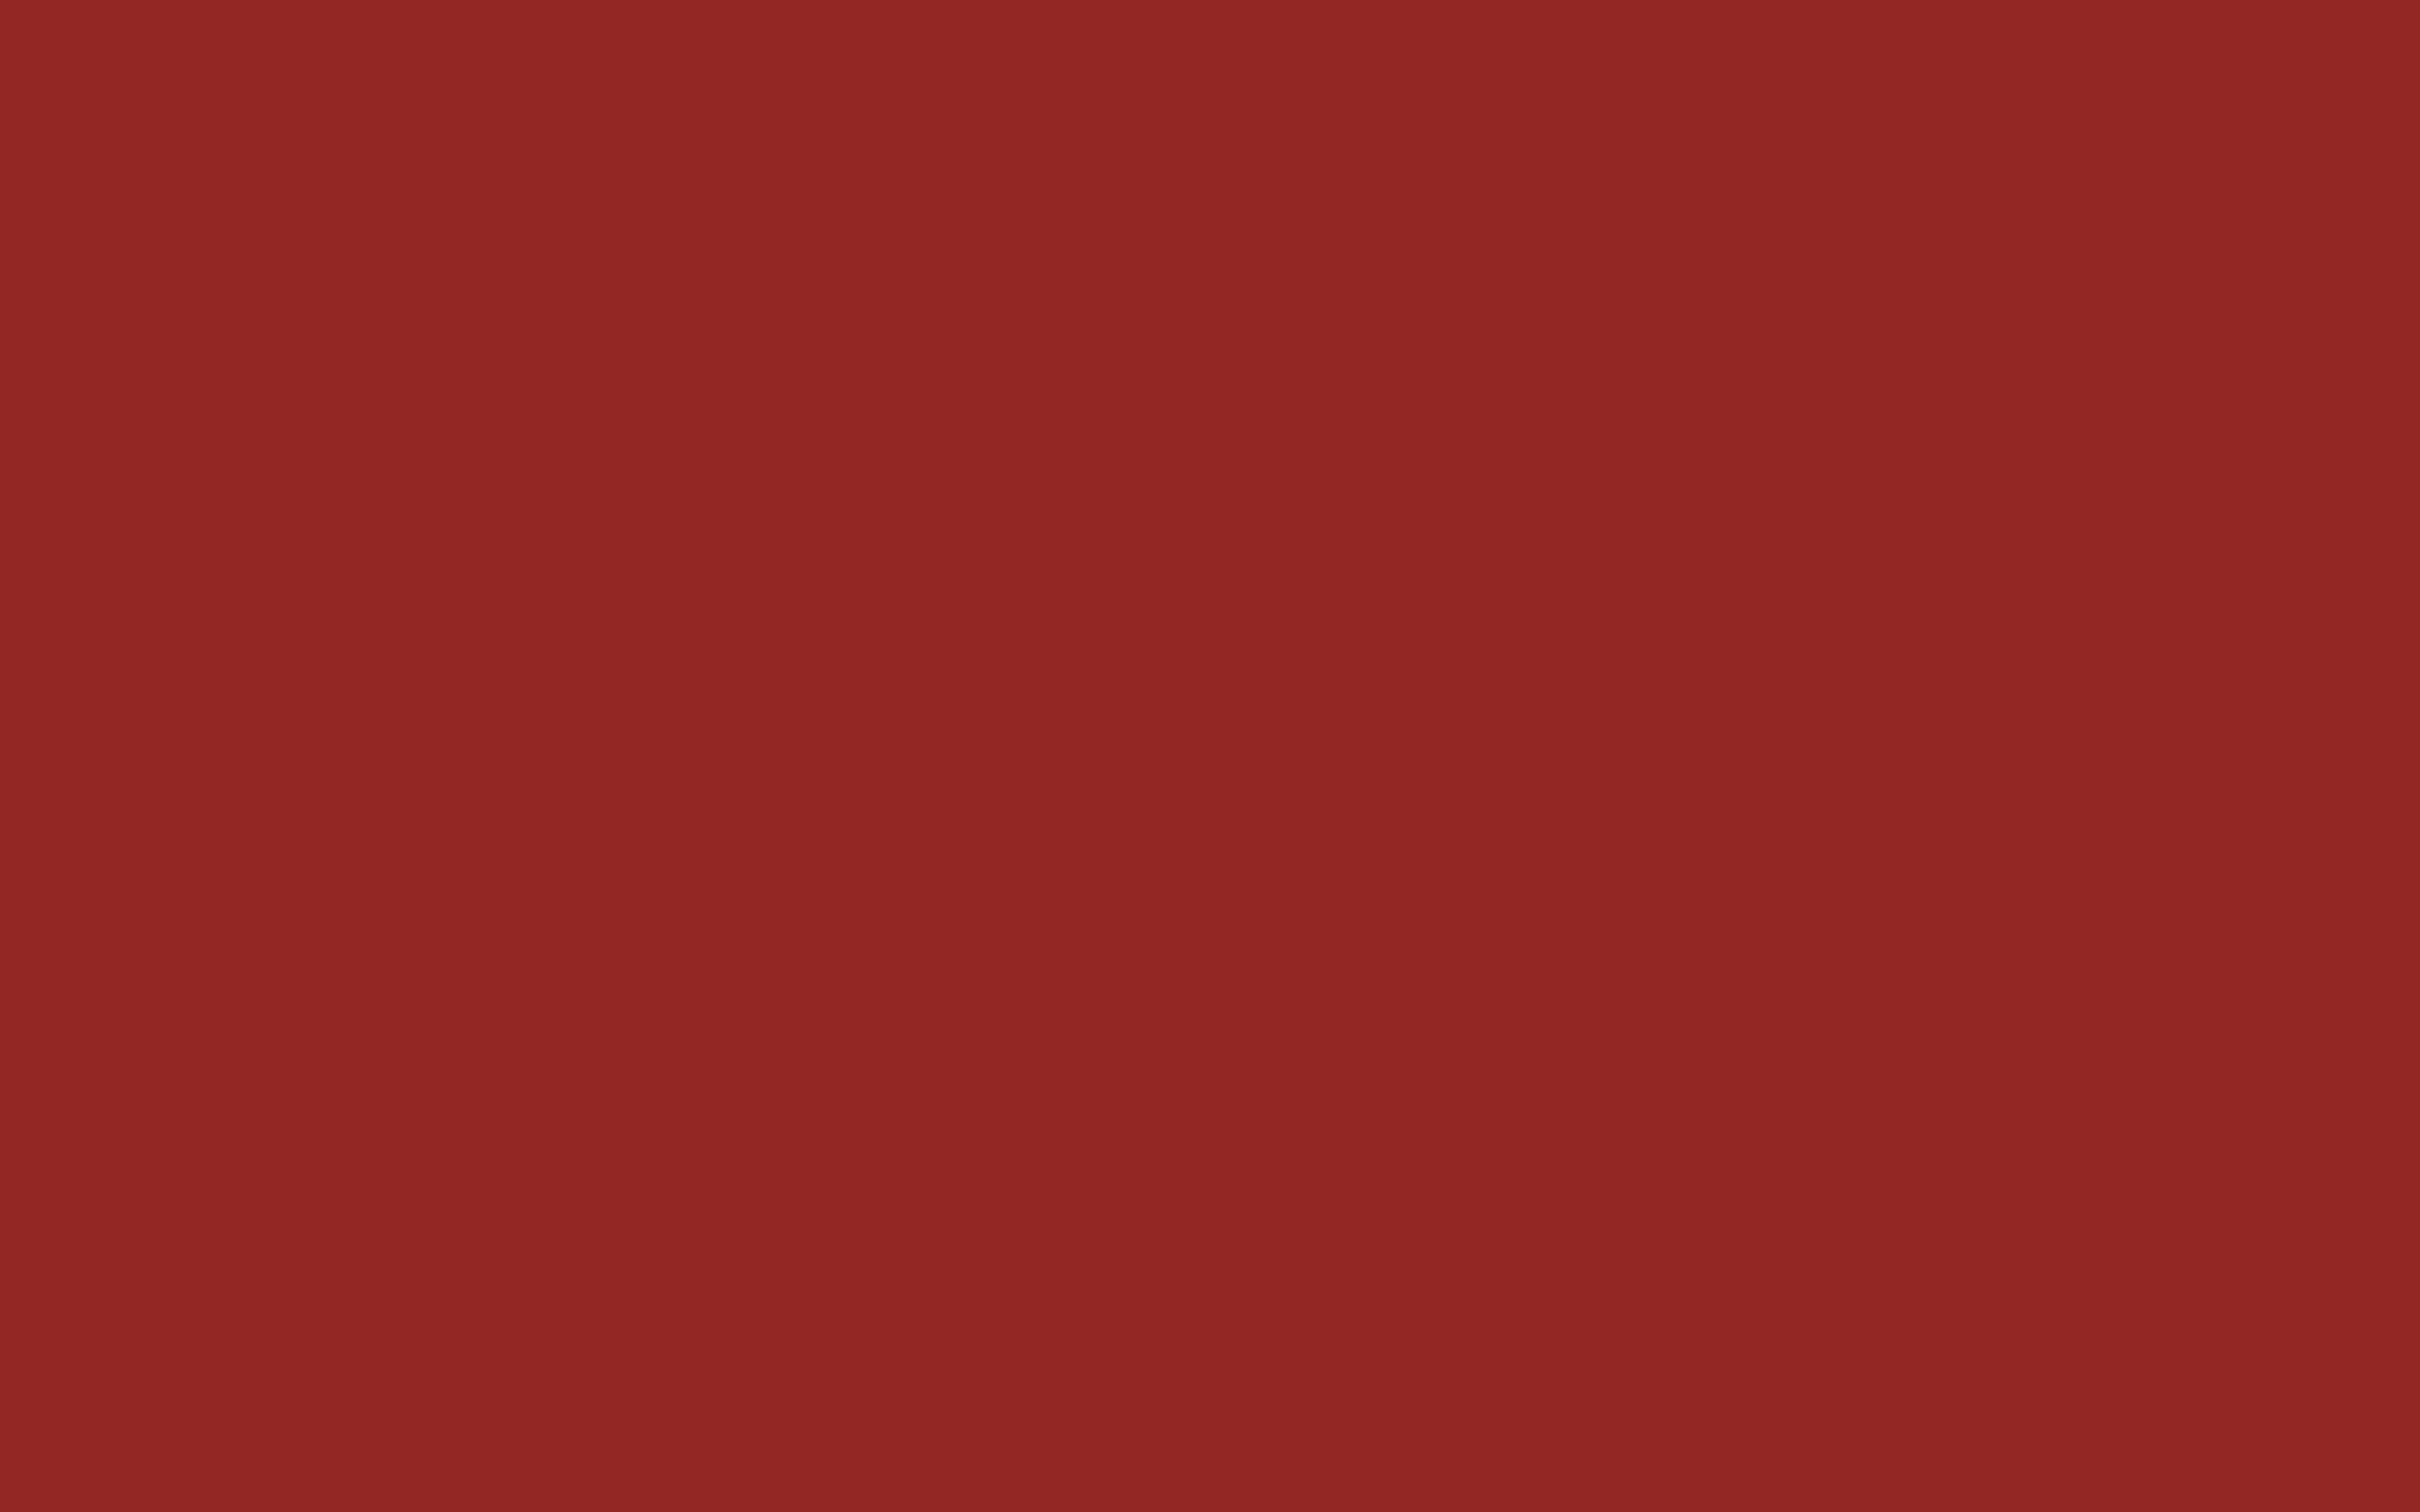 2560x1600 Vivid Auburn Solid Color Background